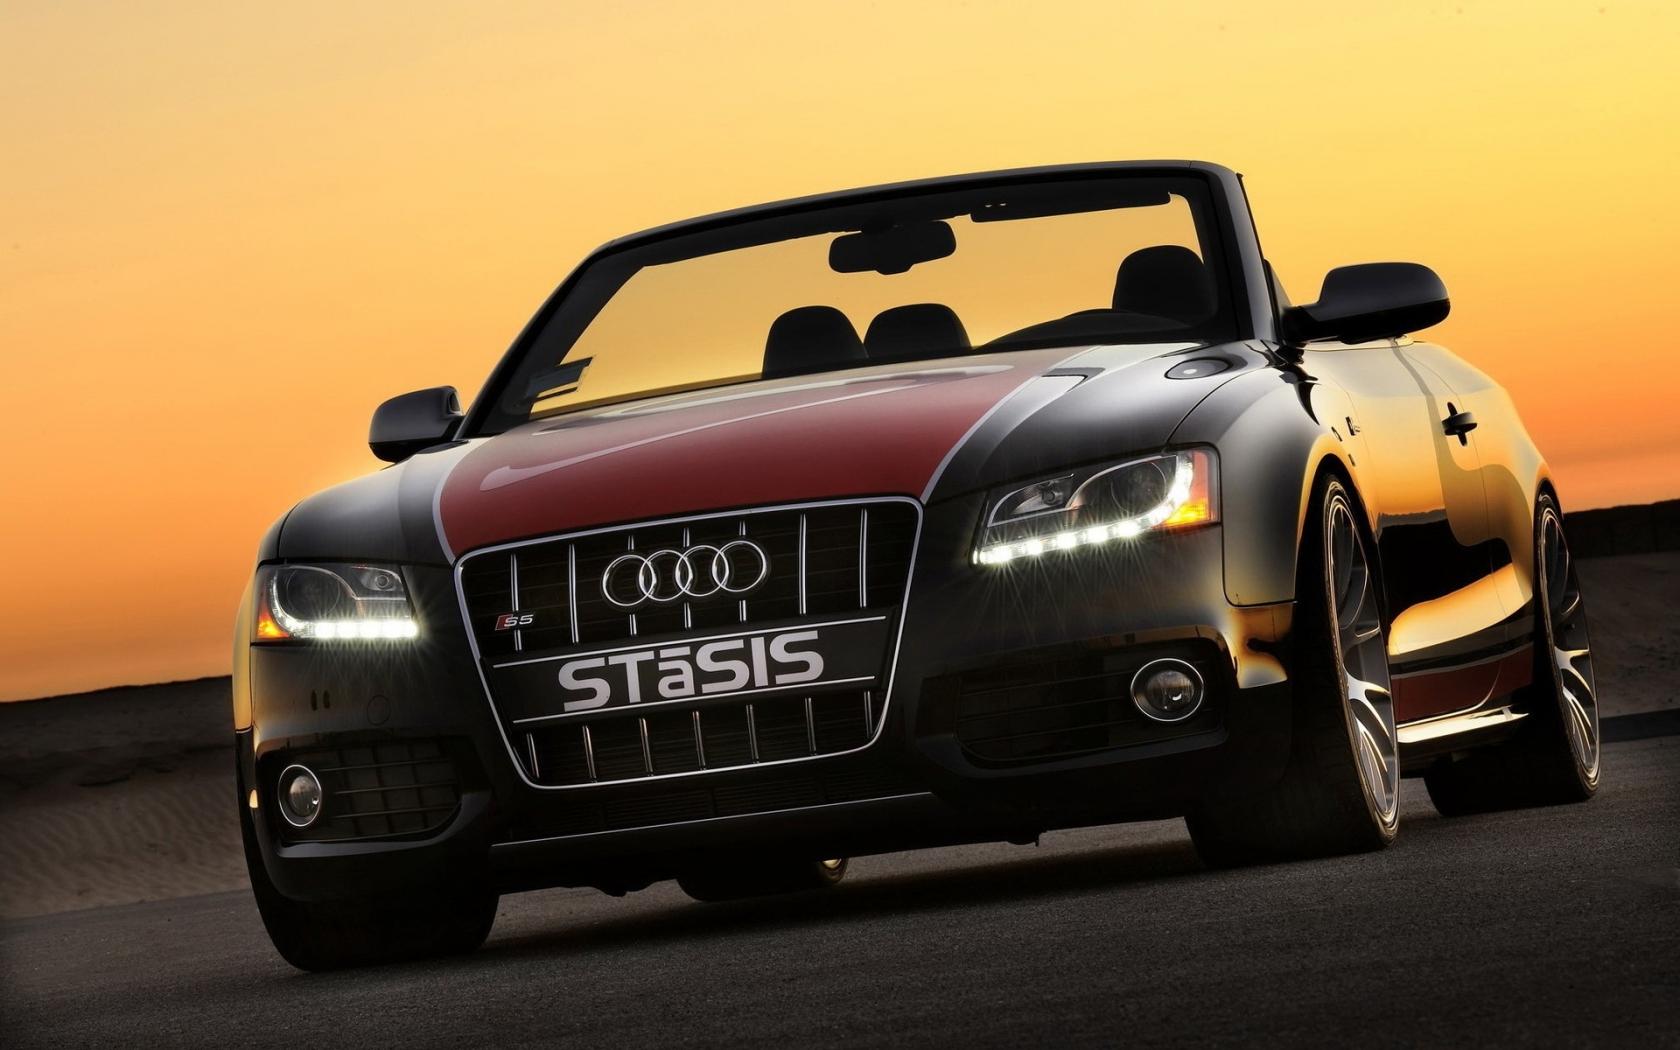 Audi Stasis 2014 - 1680x1050